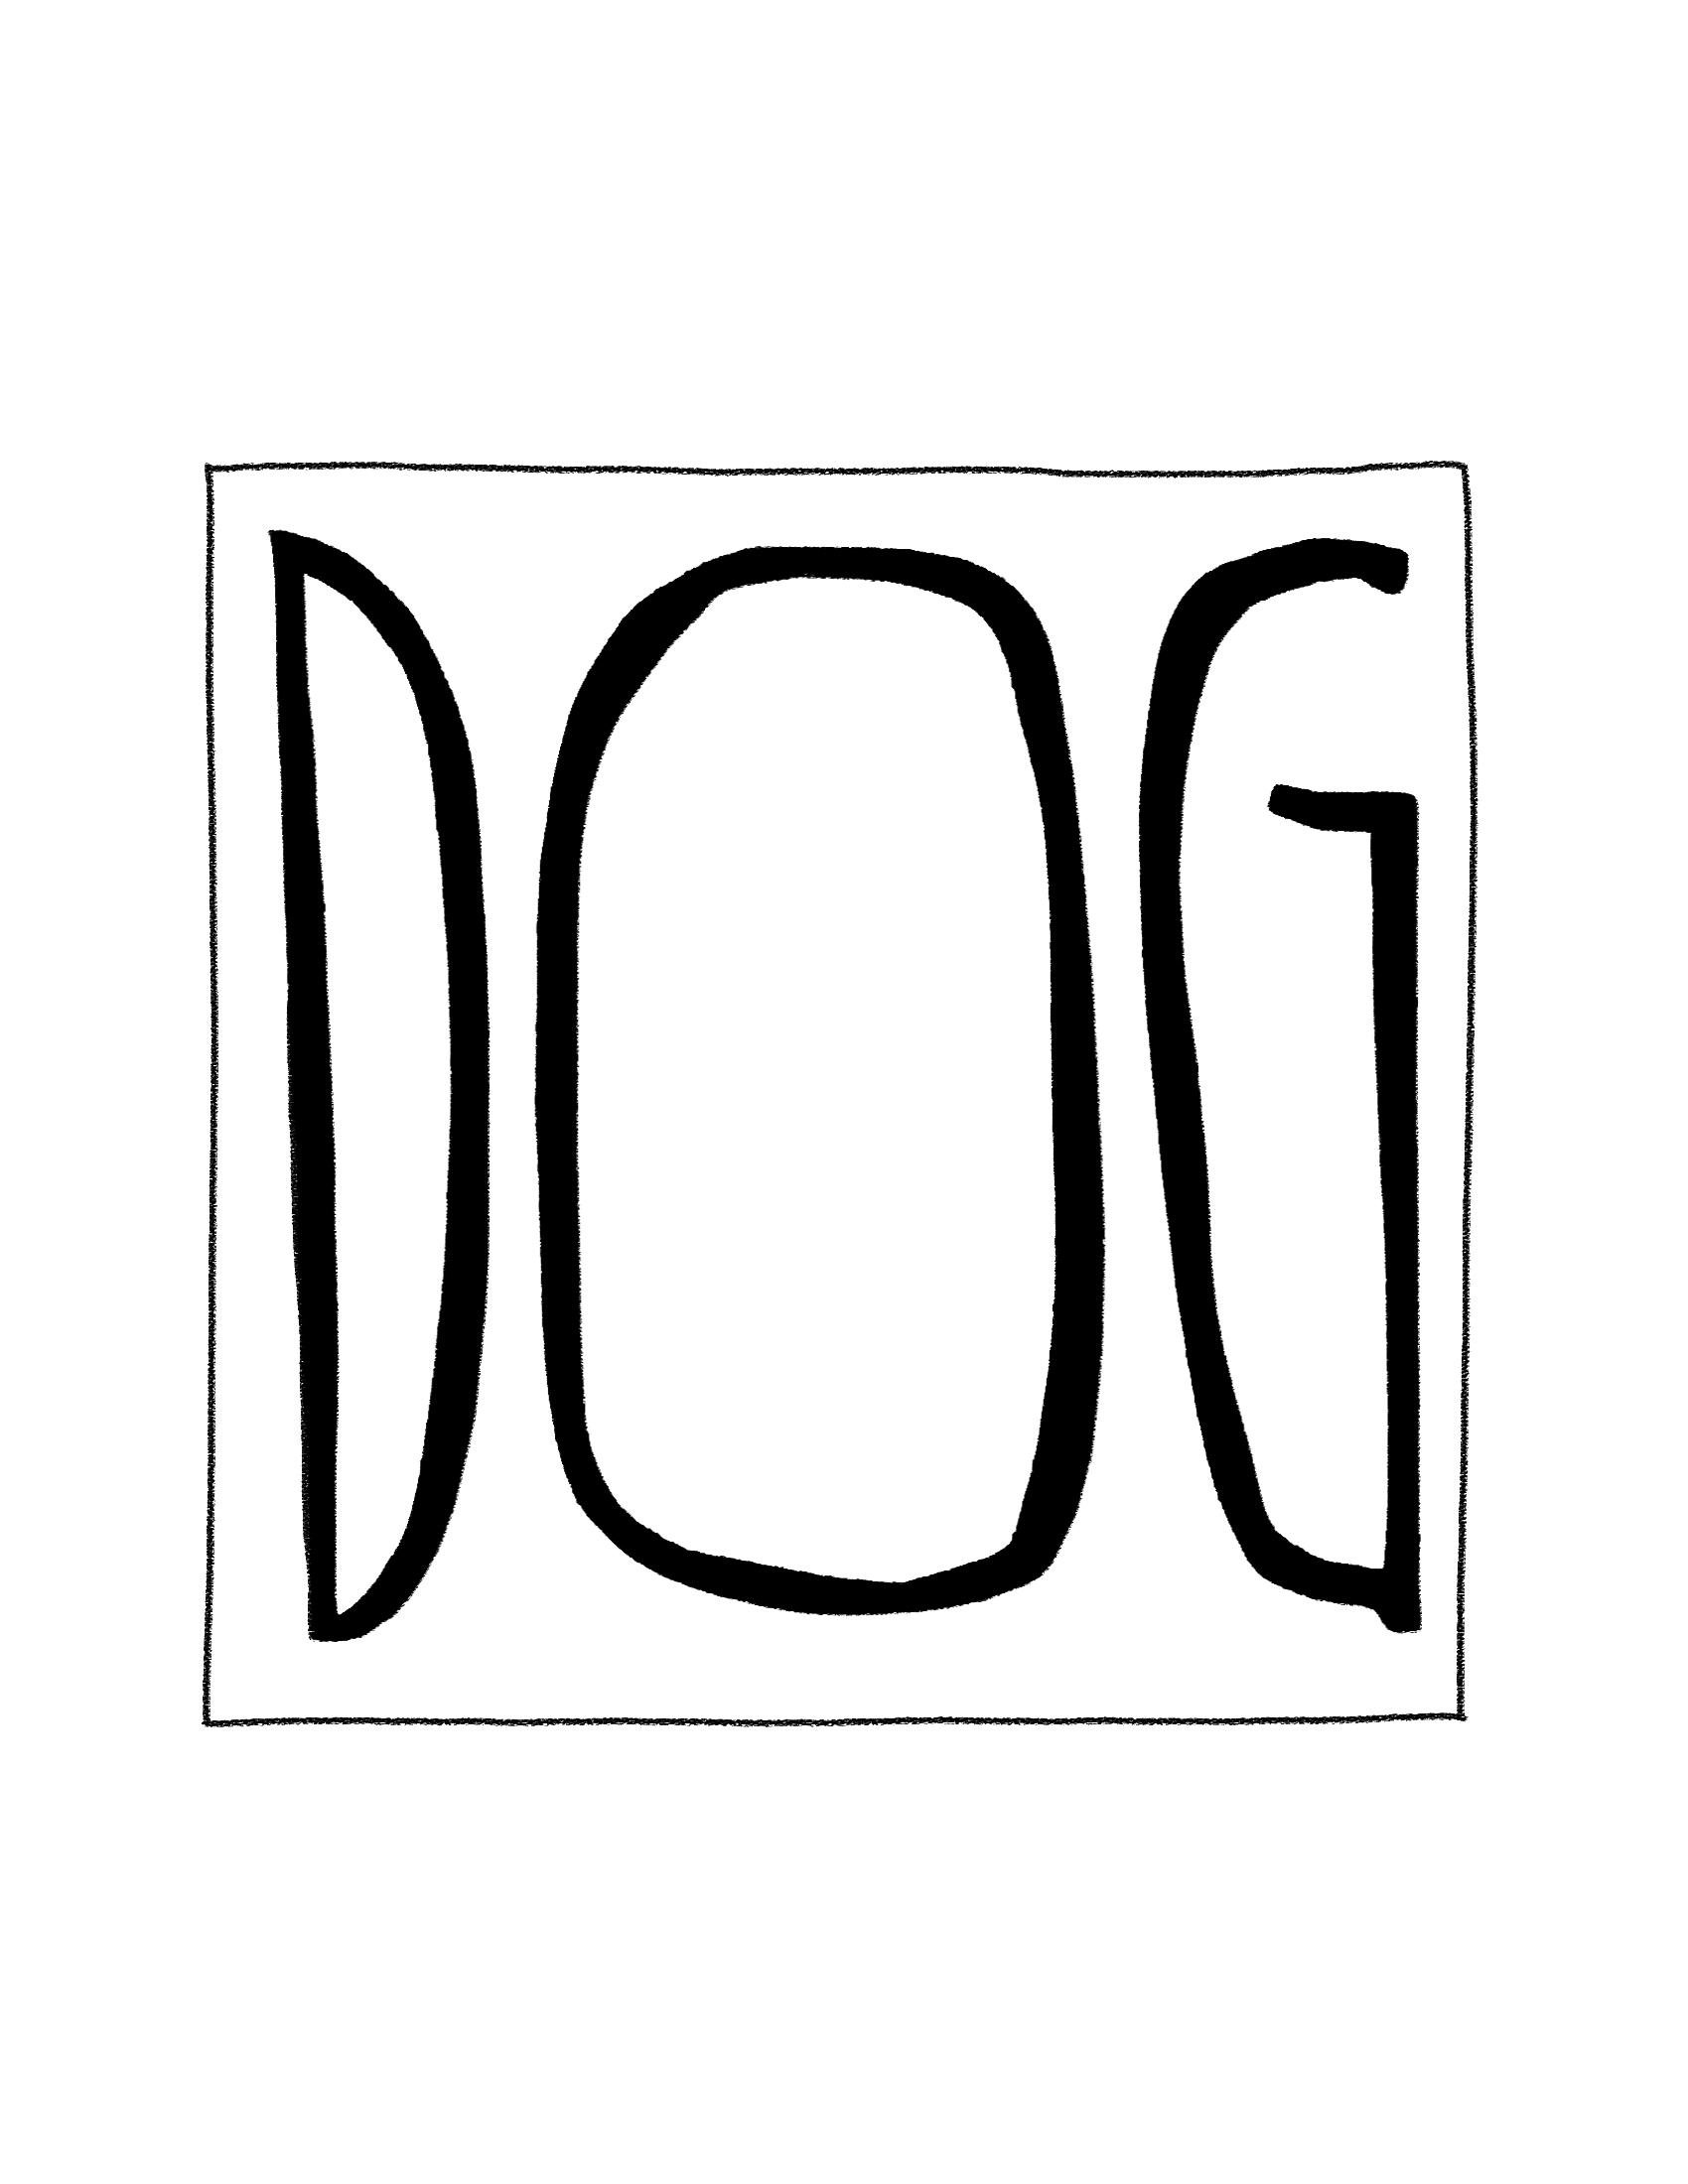 zodiac_0022_dog.jpg